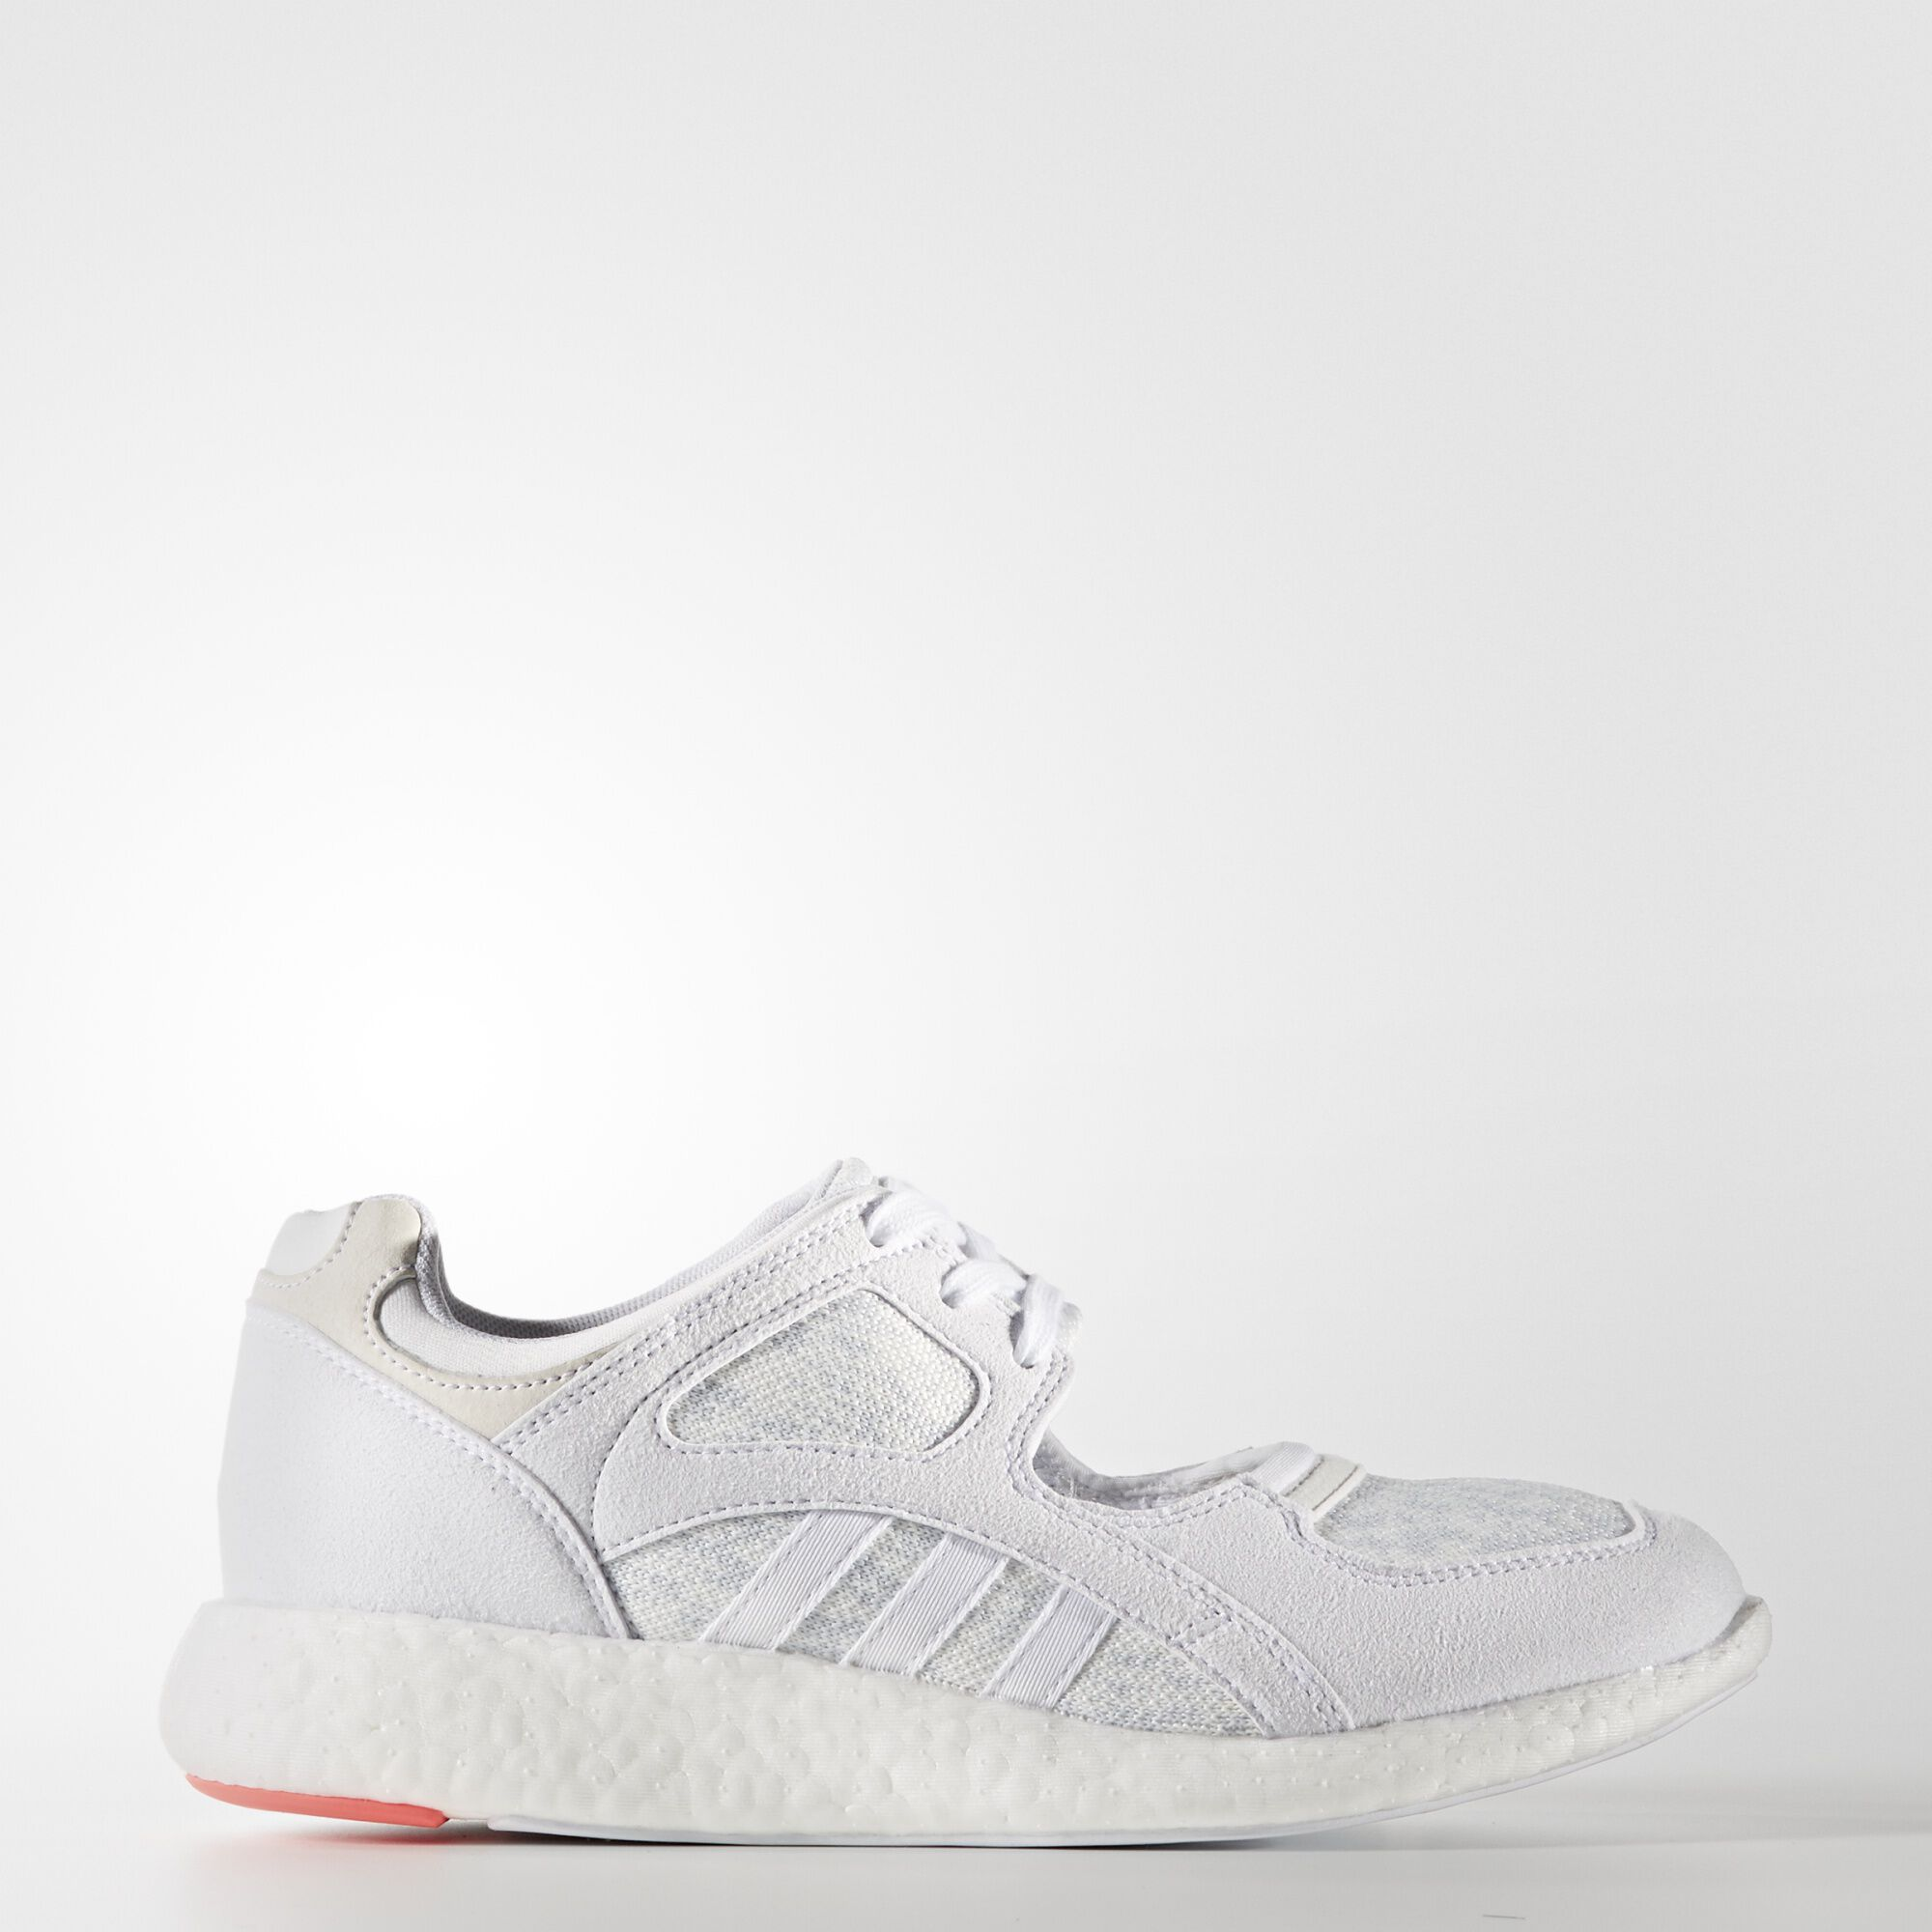 Adidas Eqt Racer White